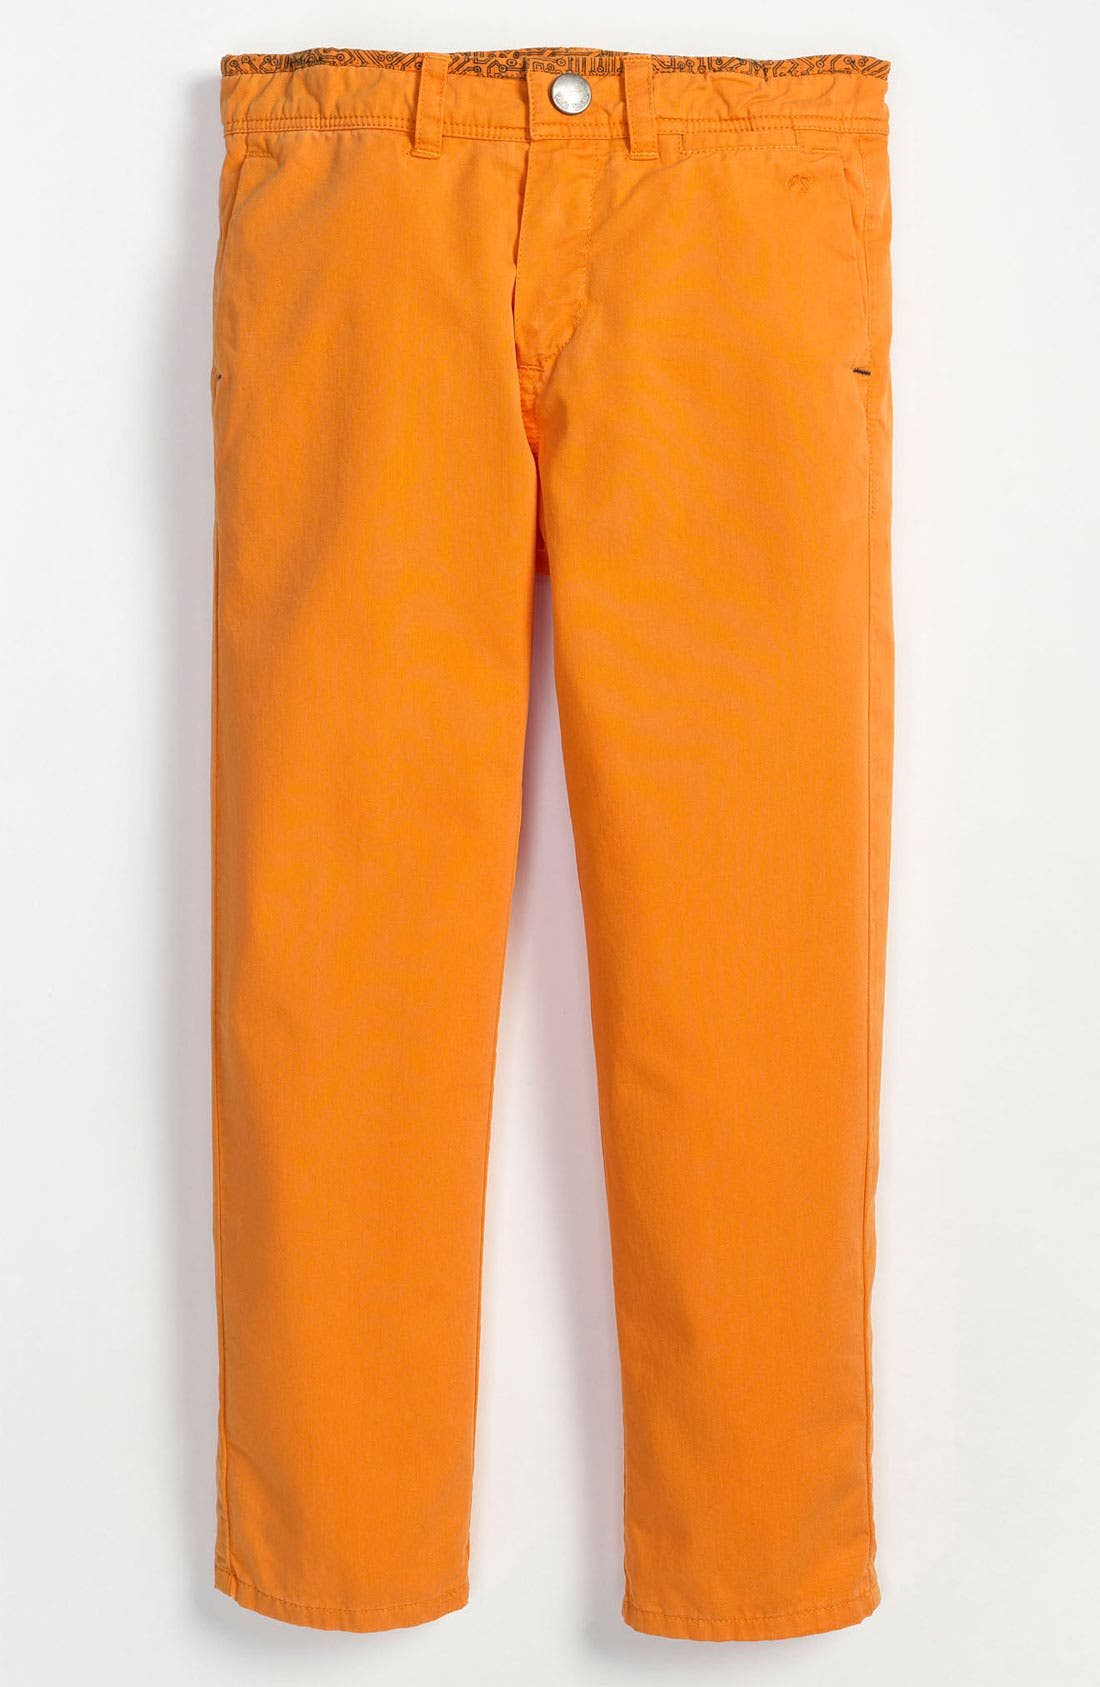 Alternate Image 1 Selected - Paul Smith Junior 'Drice' Straight Leg Pants (Little Boys & Big Boys)